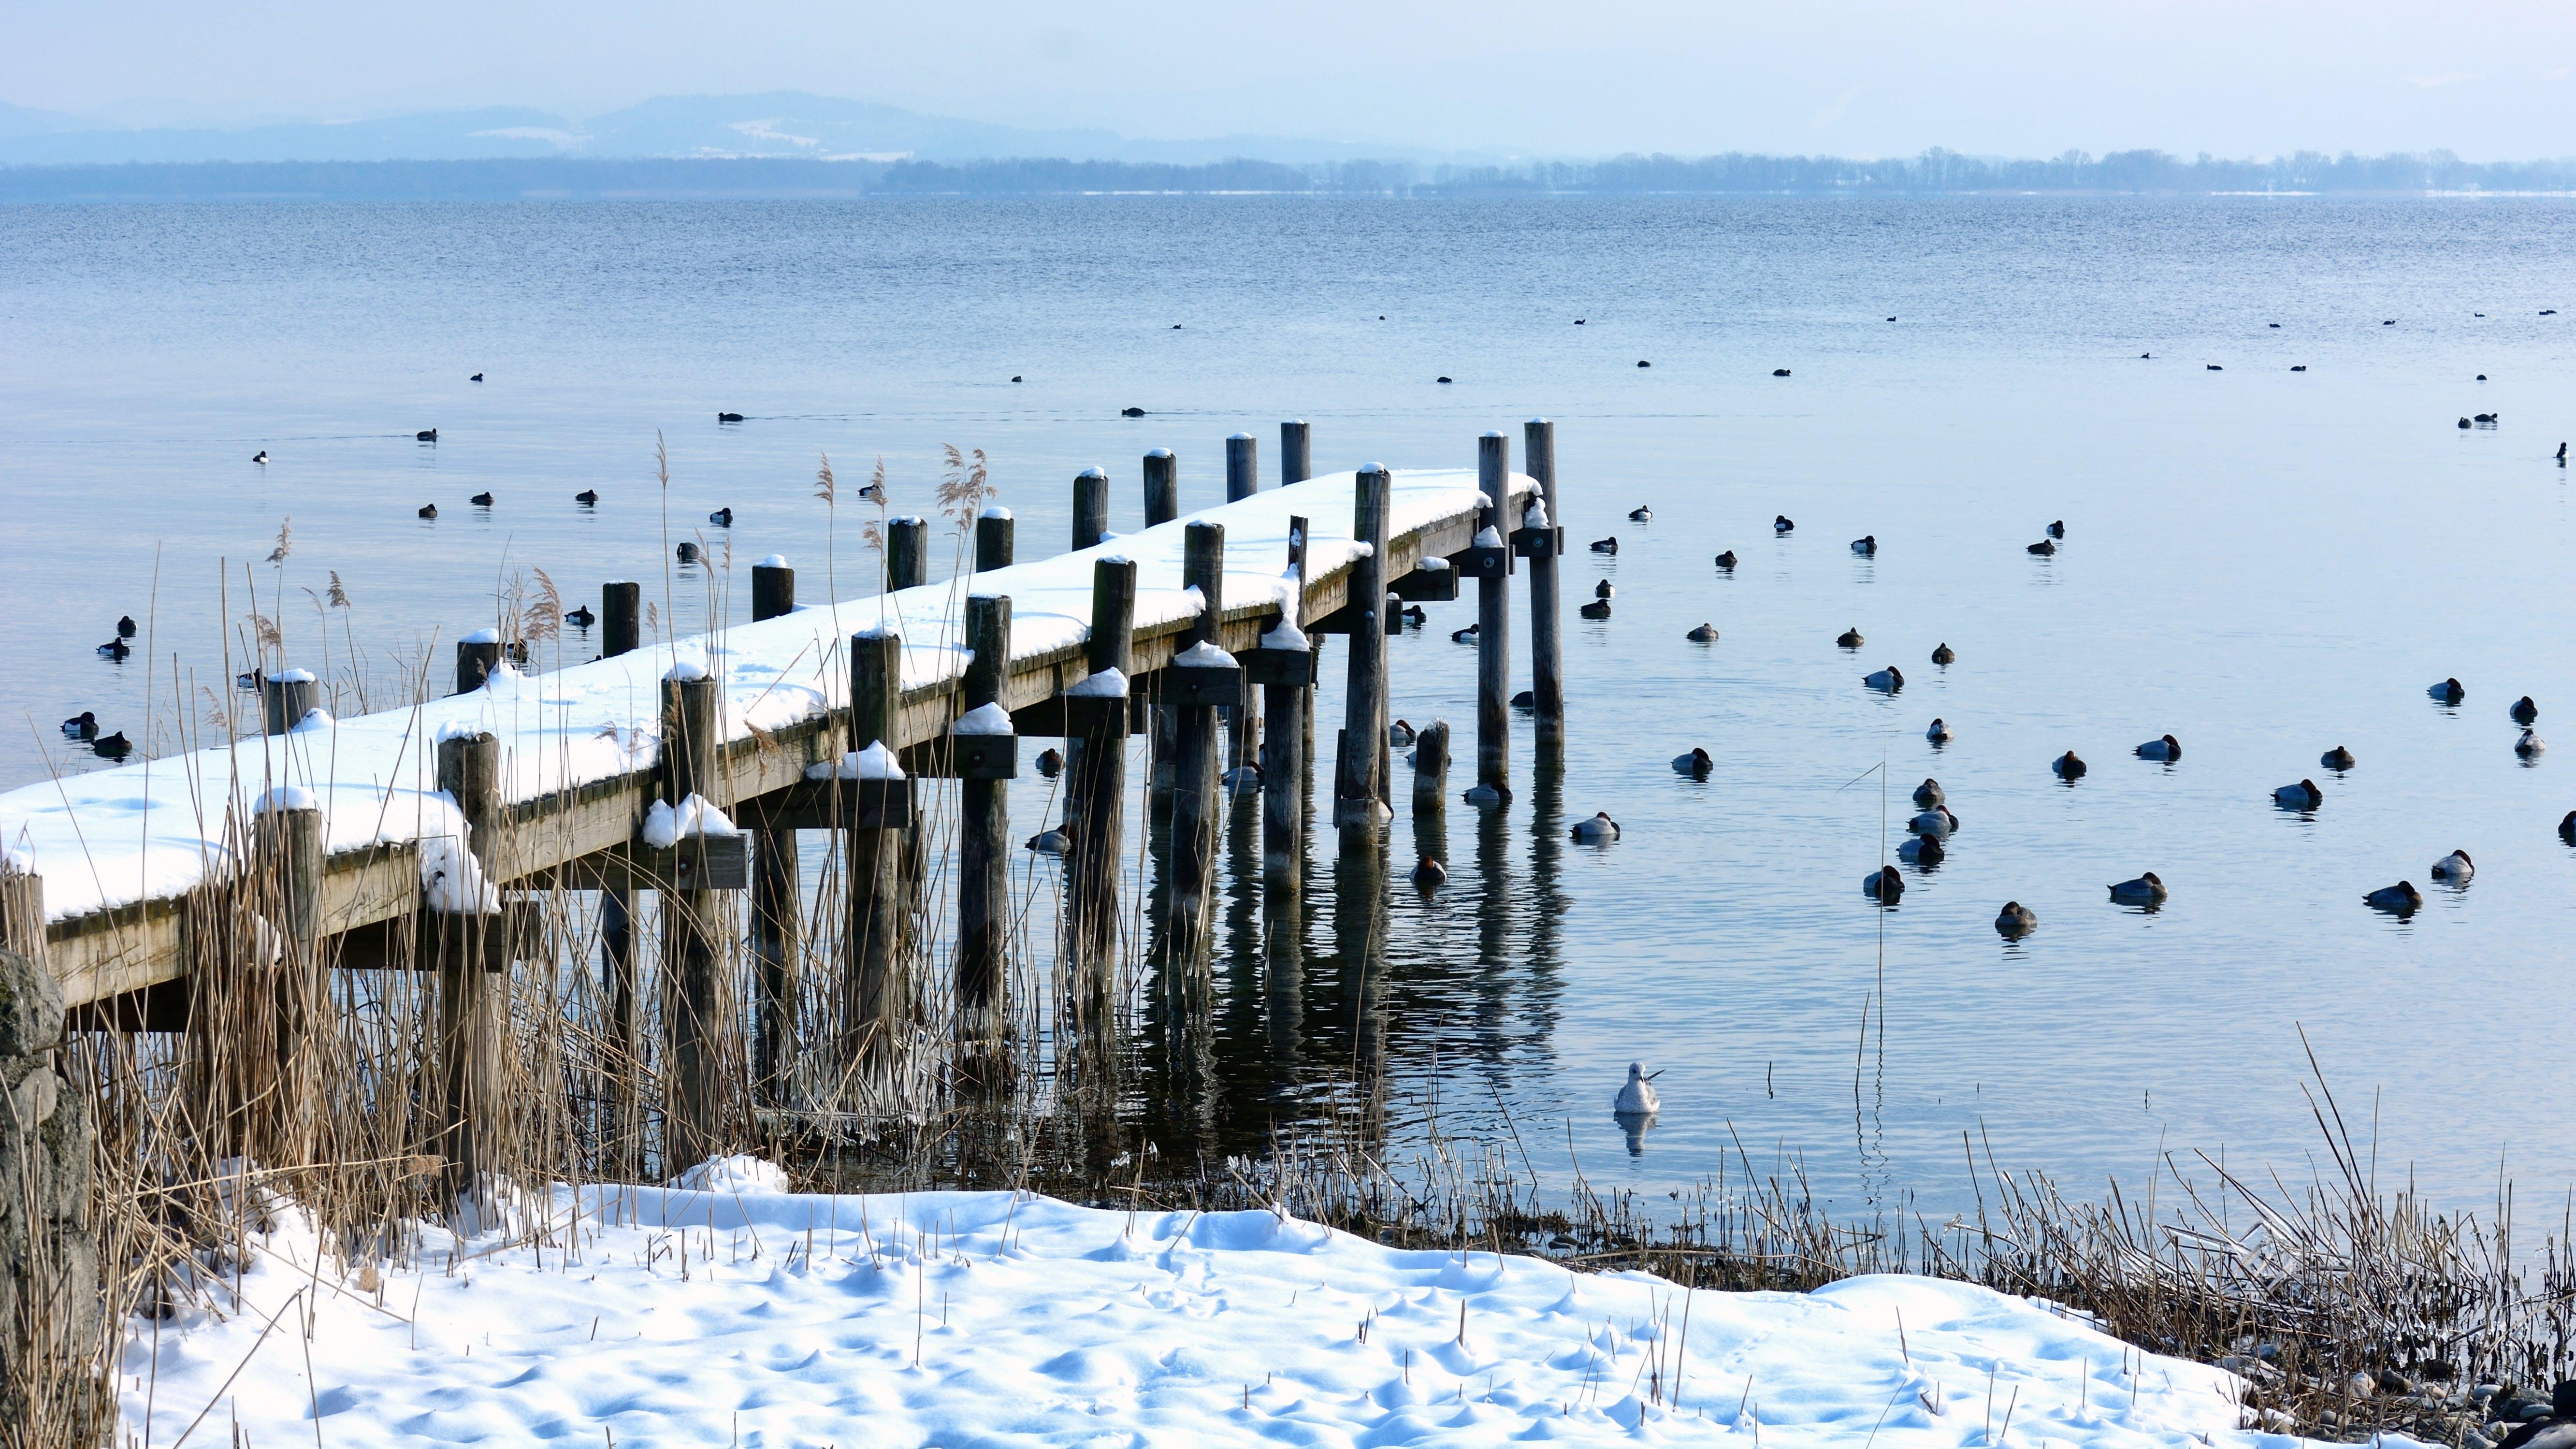 Birds on Body of Water